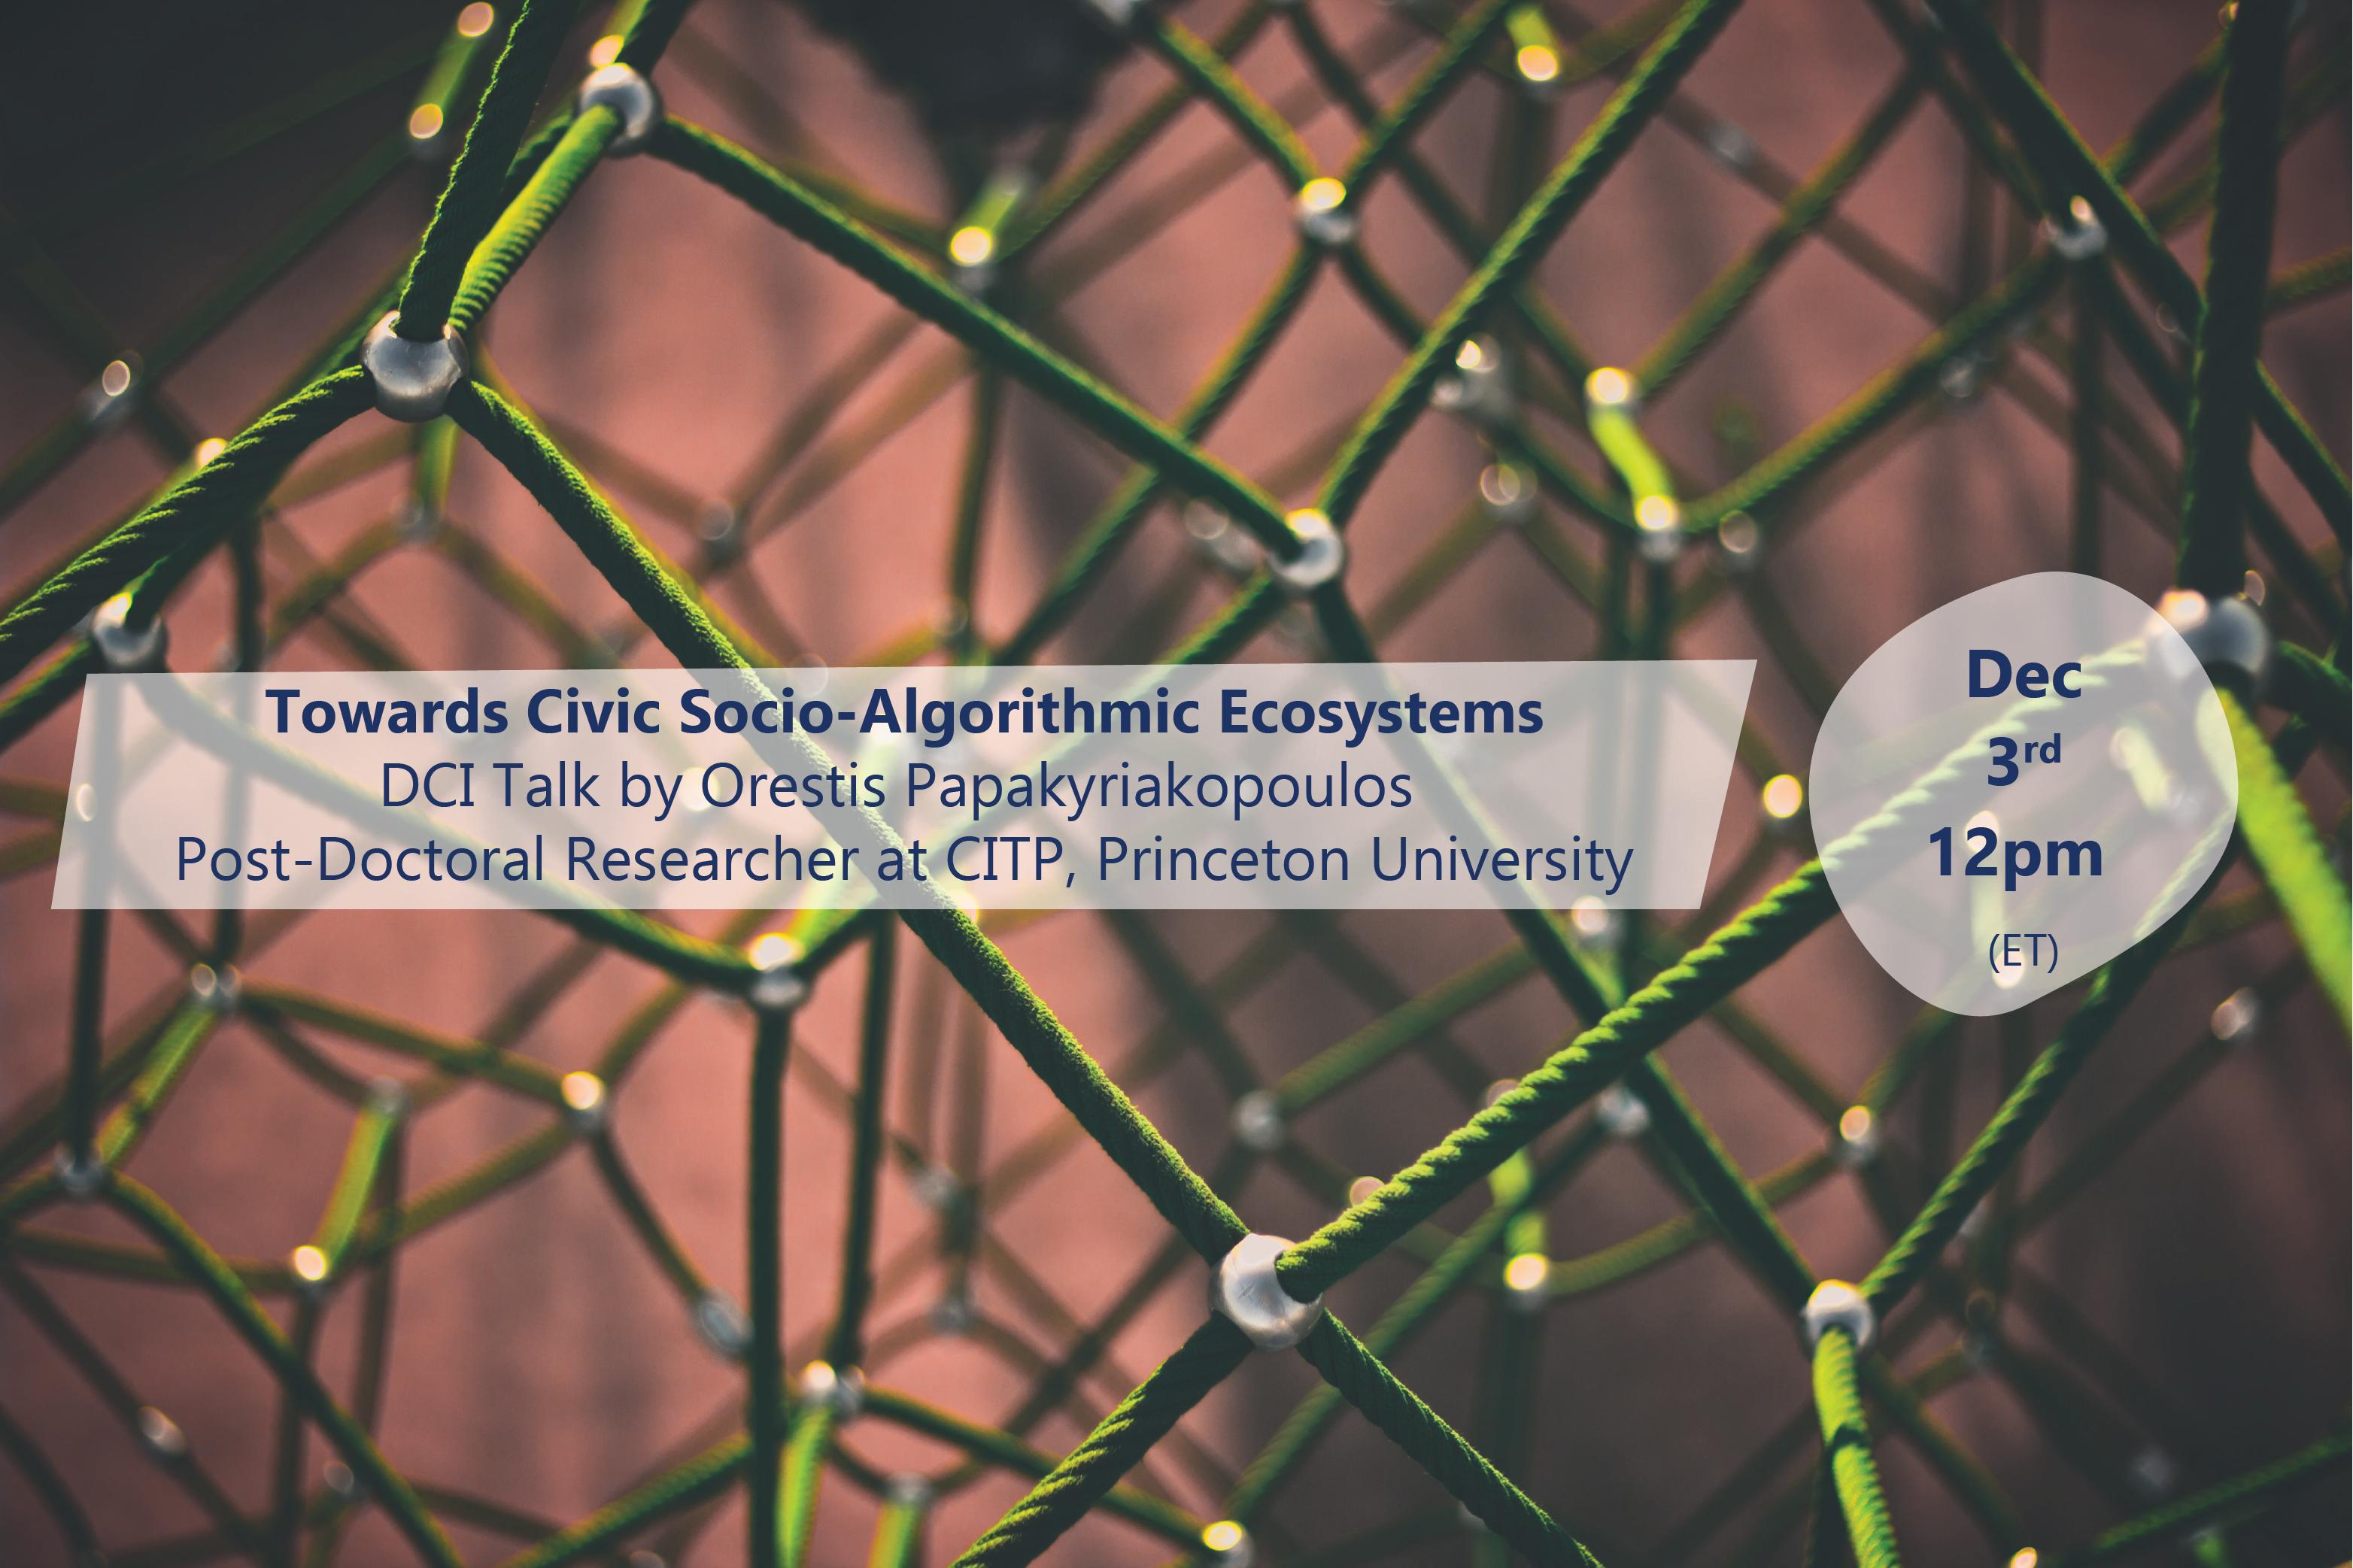 DCI Talk Dec 3: Towards Civic Socio-Algorithmic Ecosystems